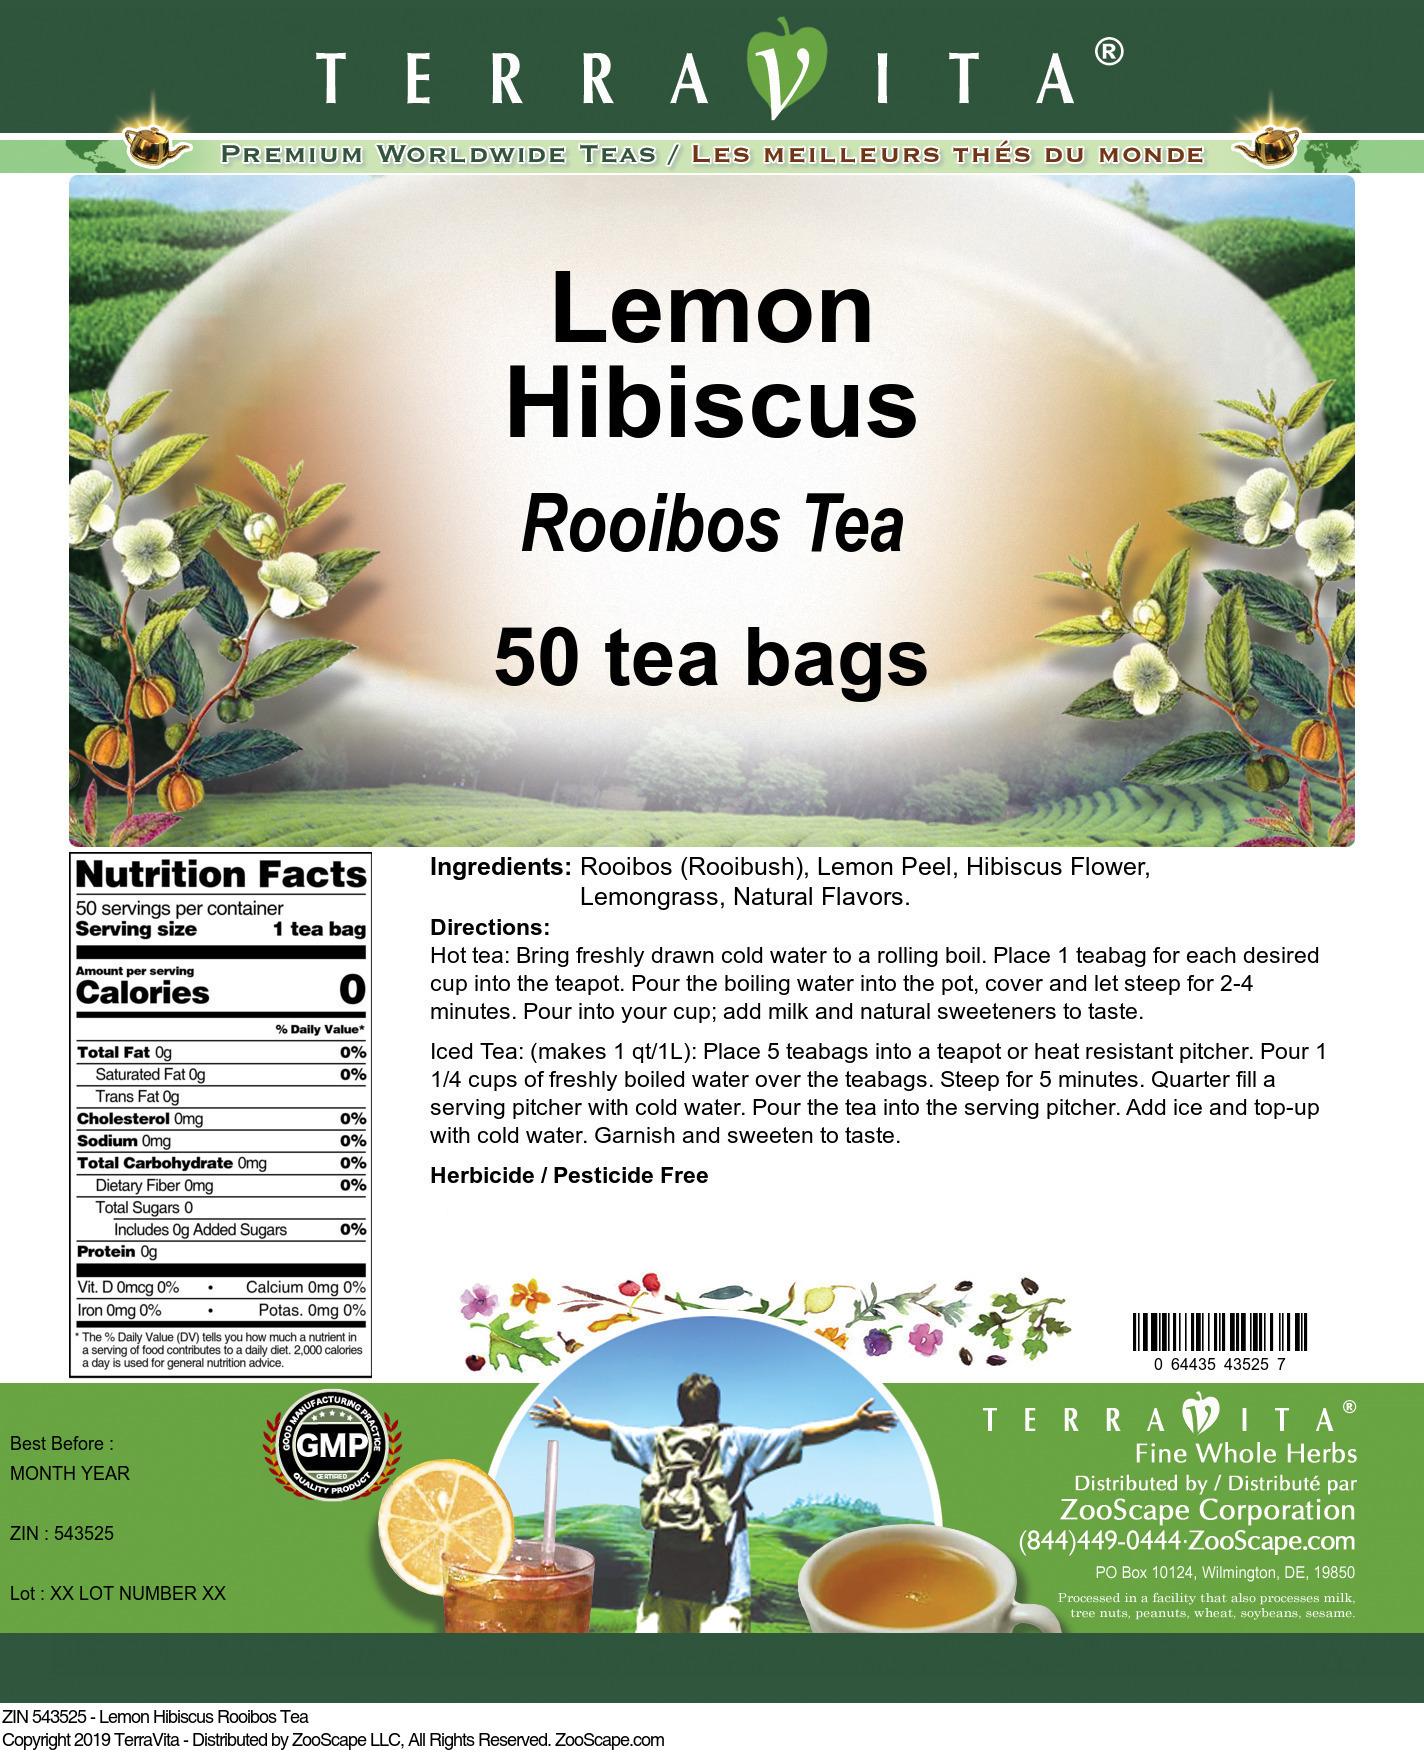 Lemon Hibiscus Rooibos Tea